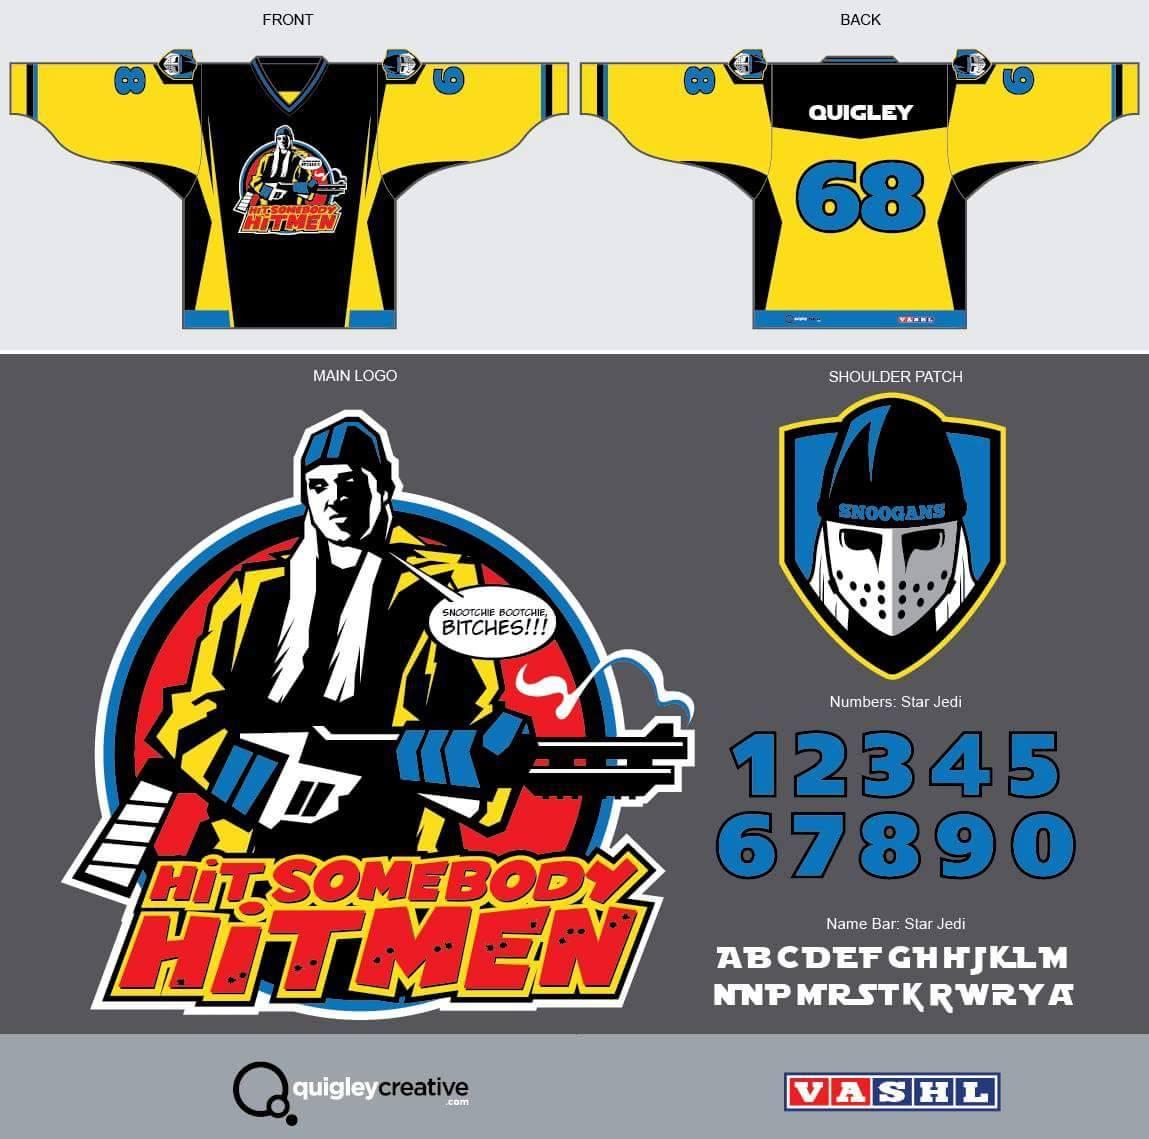 Hit Somebody Hitmen 2016 Concept Jersey Art